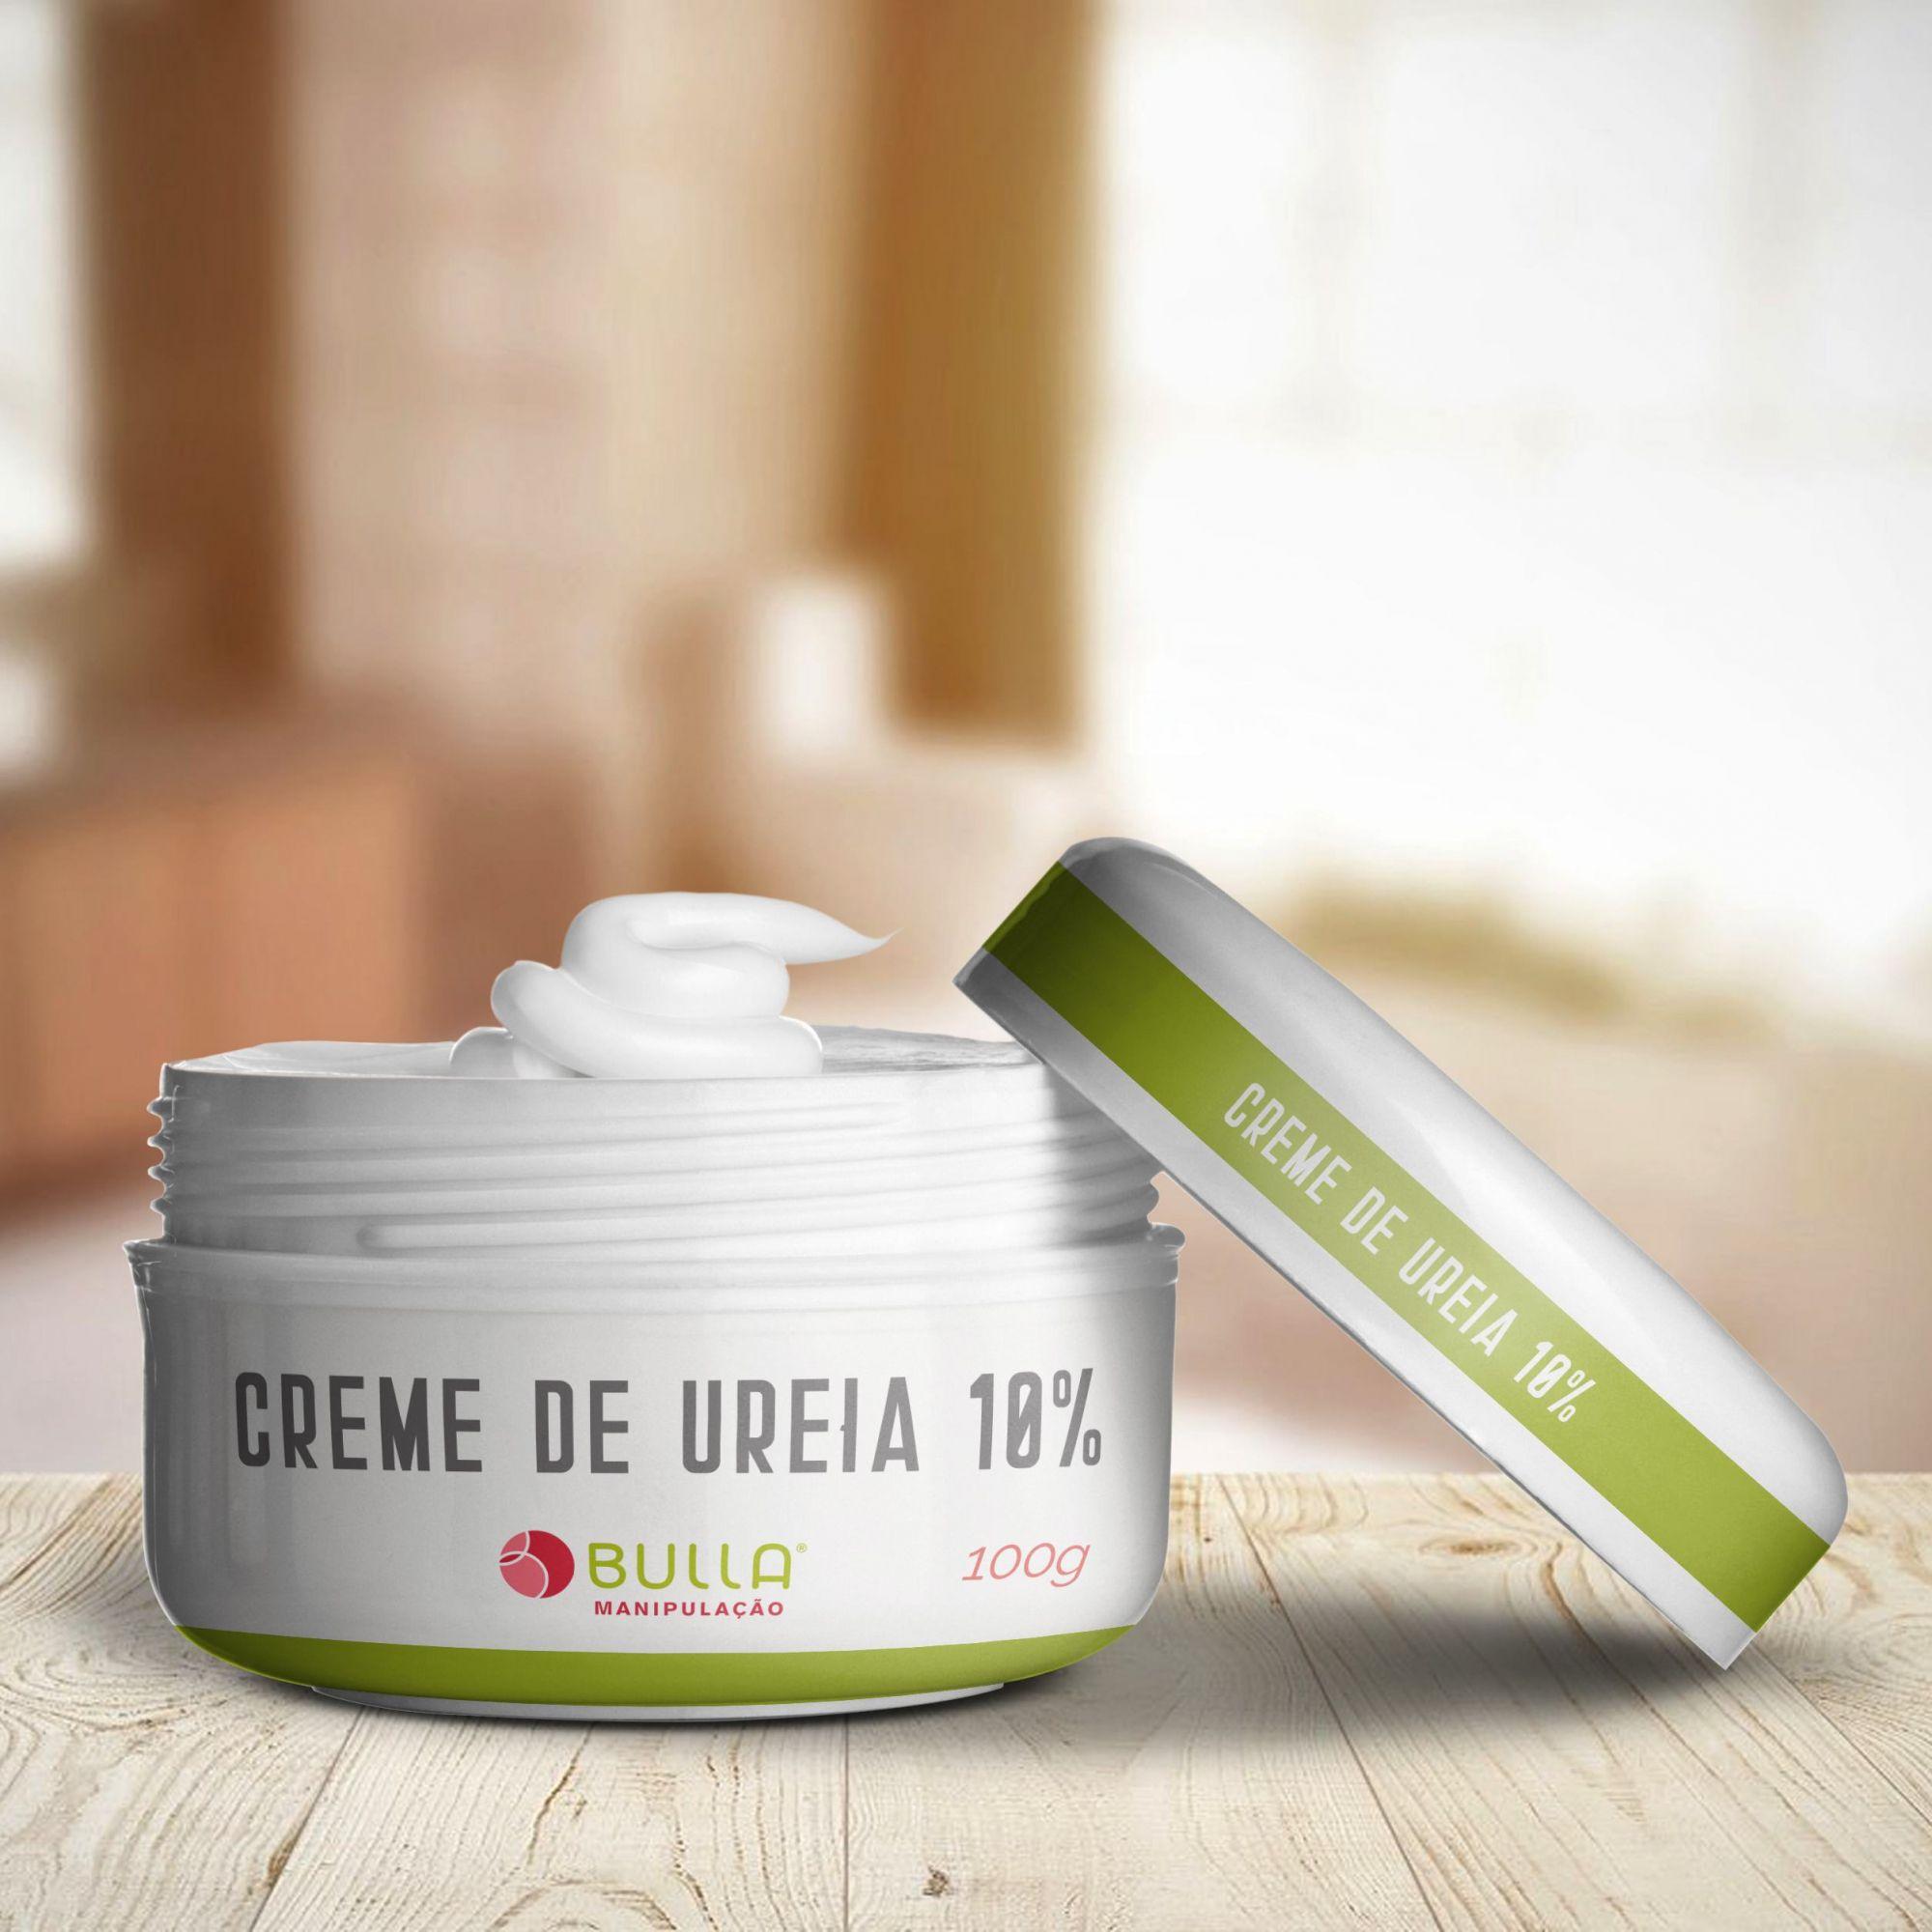 Creme de Ureia 10% - 100 g